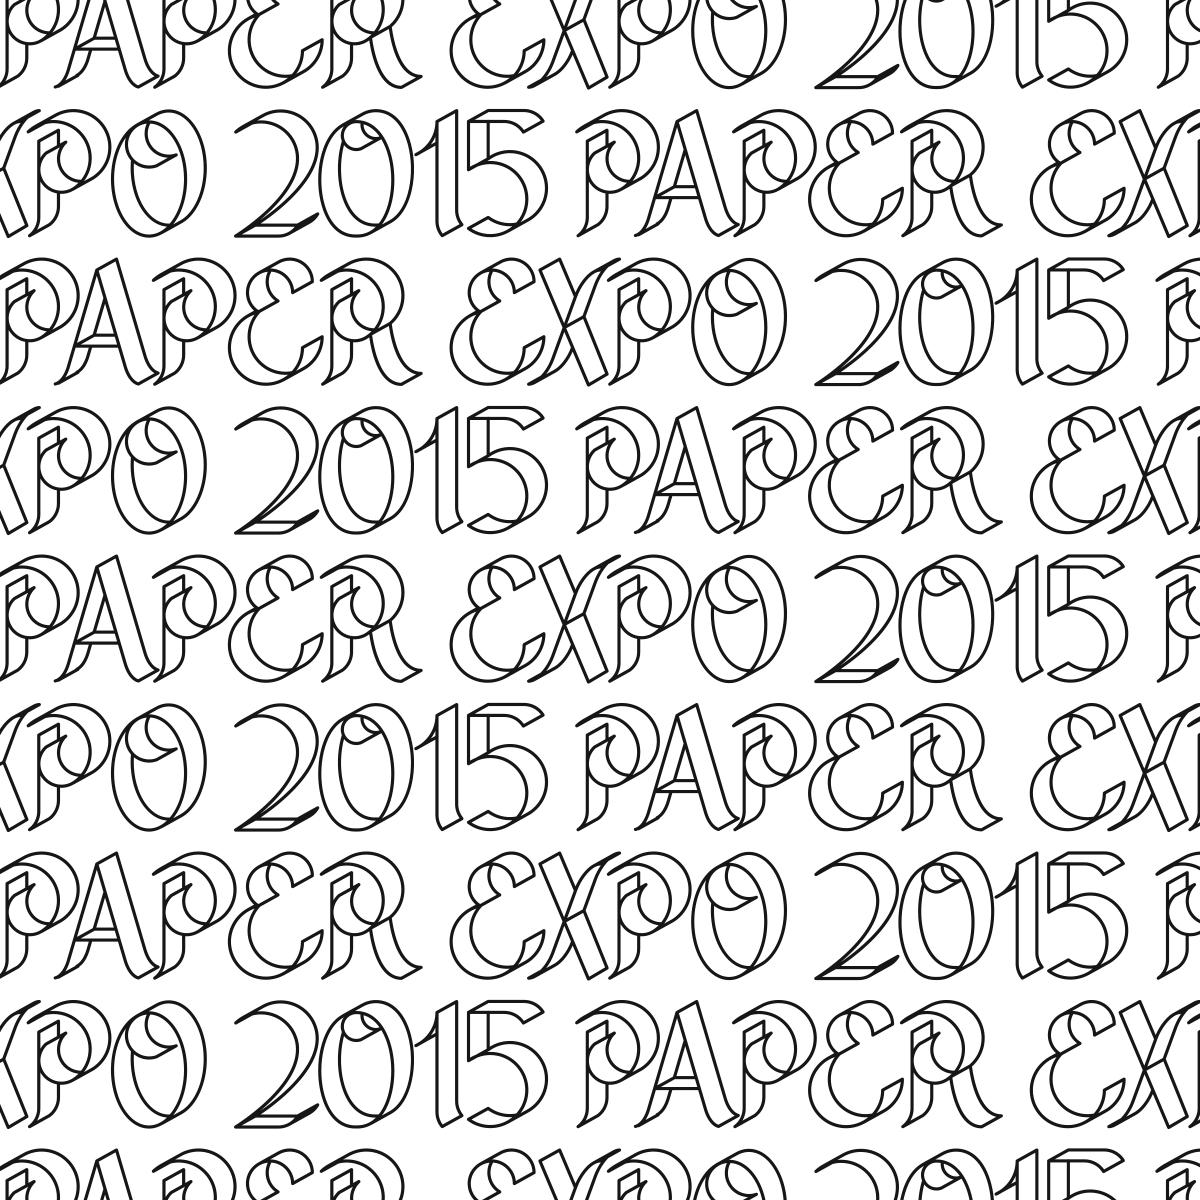 ADC_logo_pattern2.png